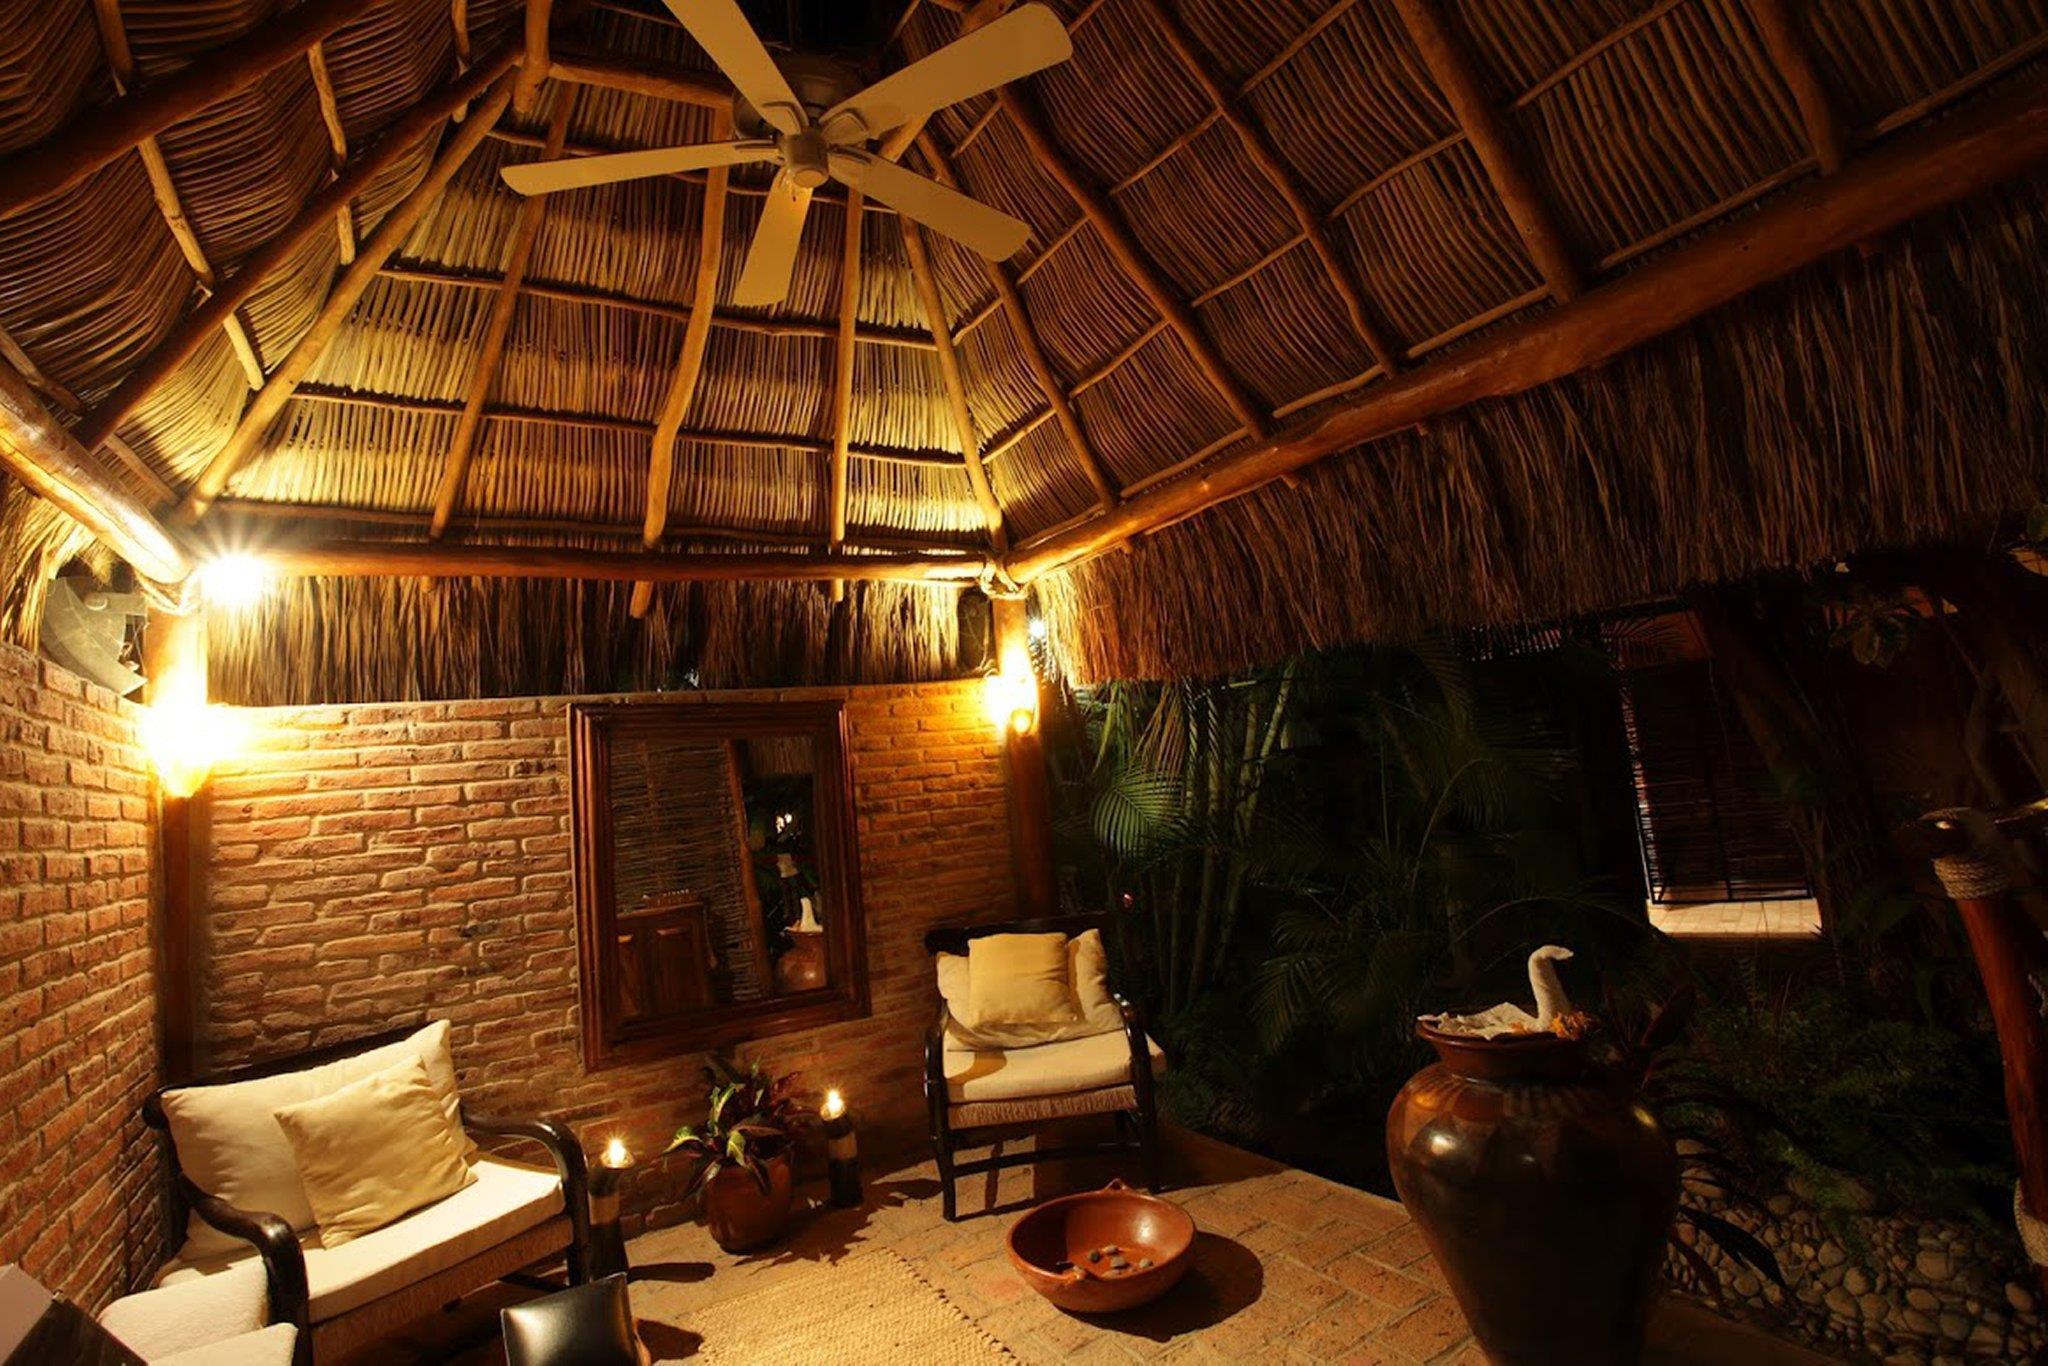 Price Hacienda Buenaventura Hotel & Mexican Charm - All Inclusive